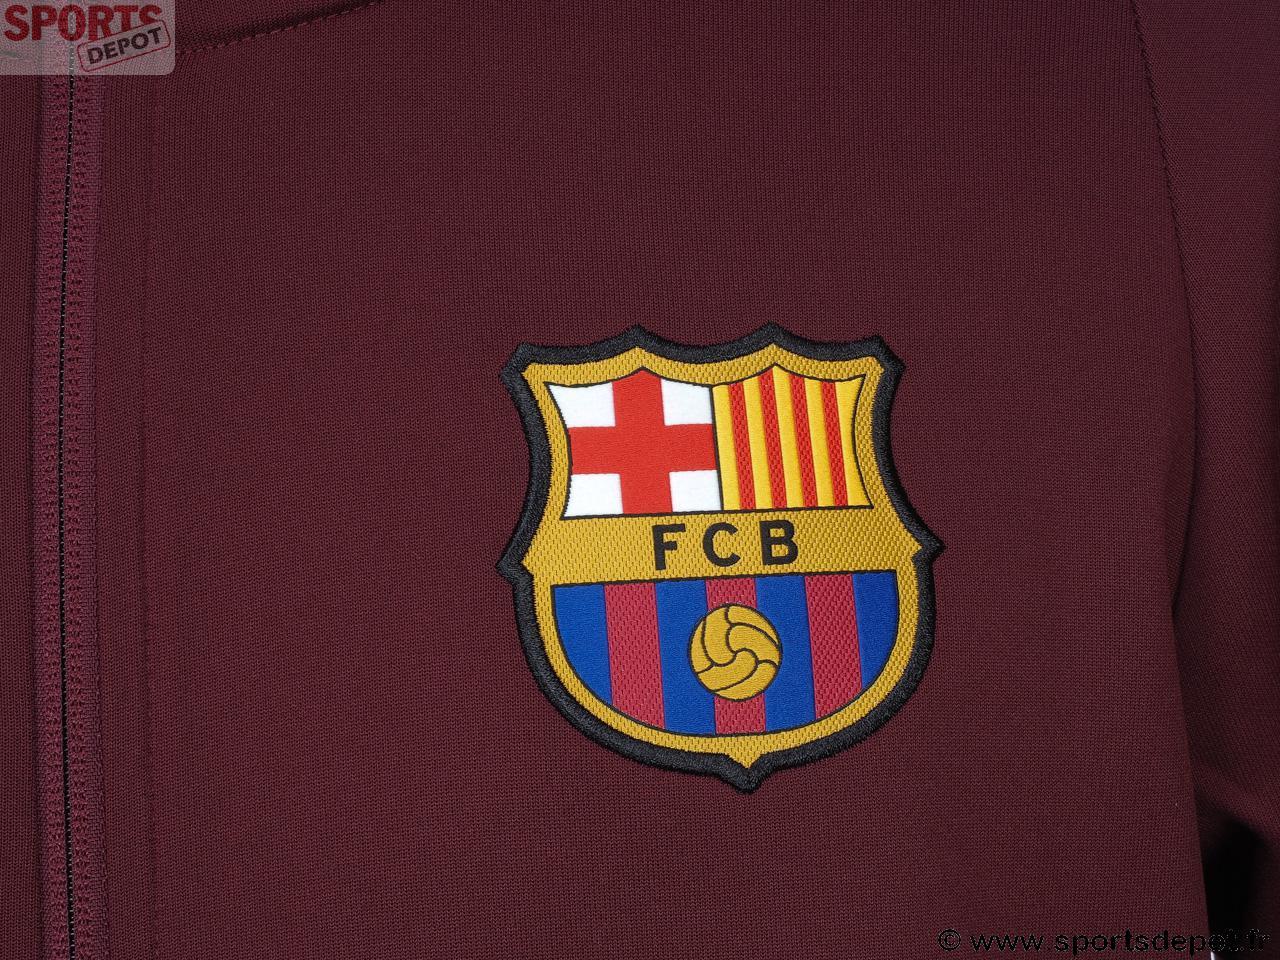 H Nike Barcelone Barca Vestes Acheter Replica Officielle Veste qHW1wO6v